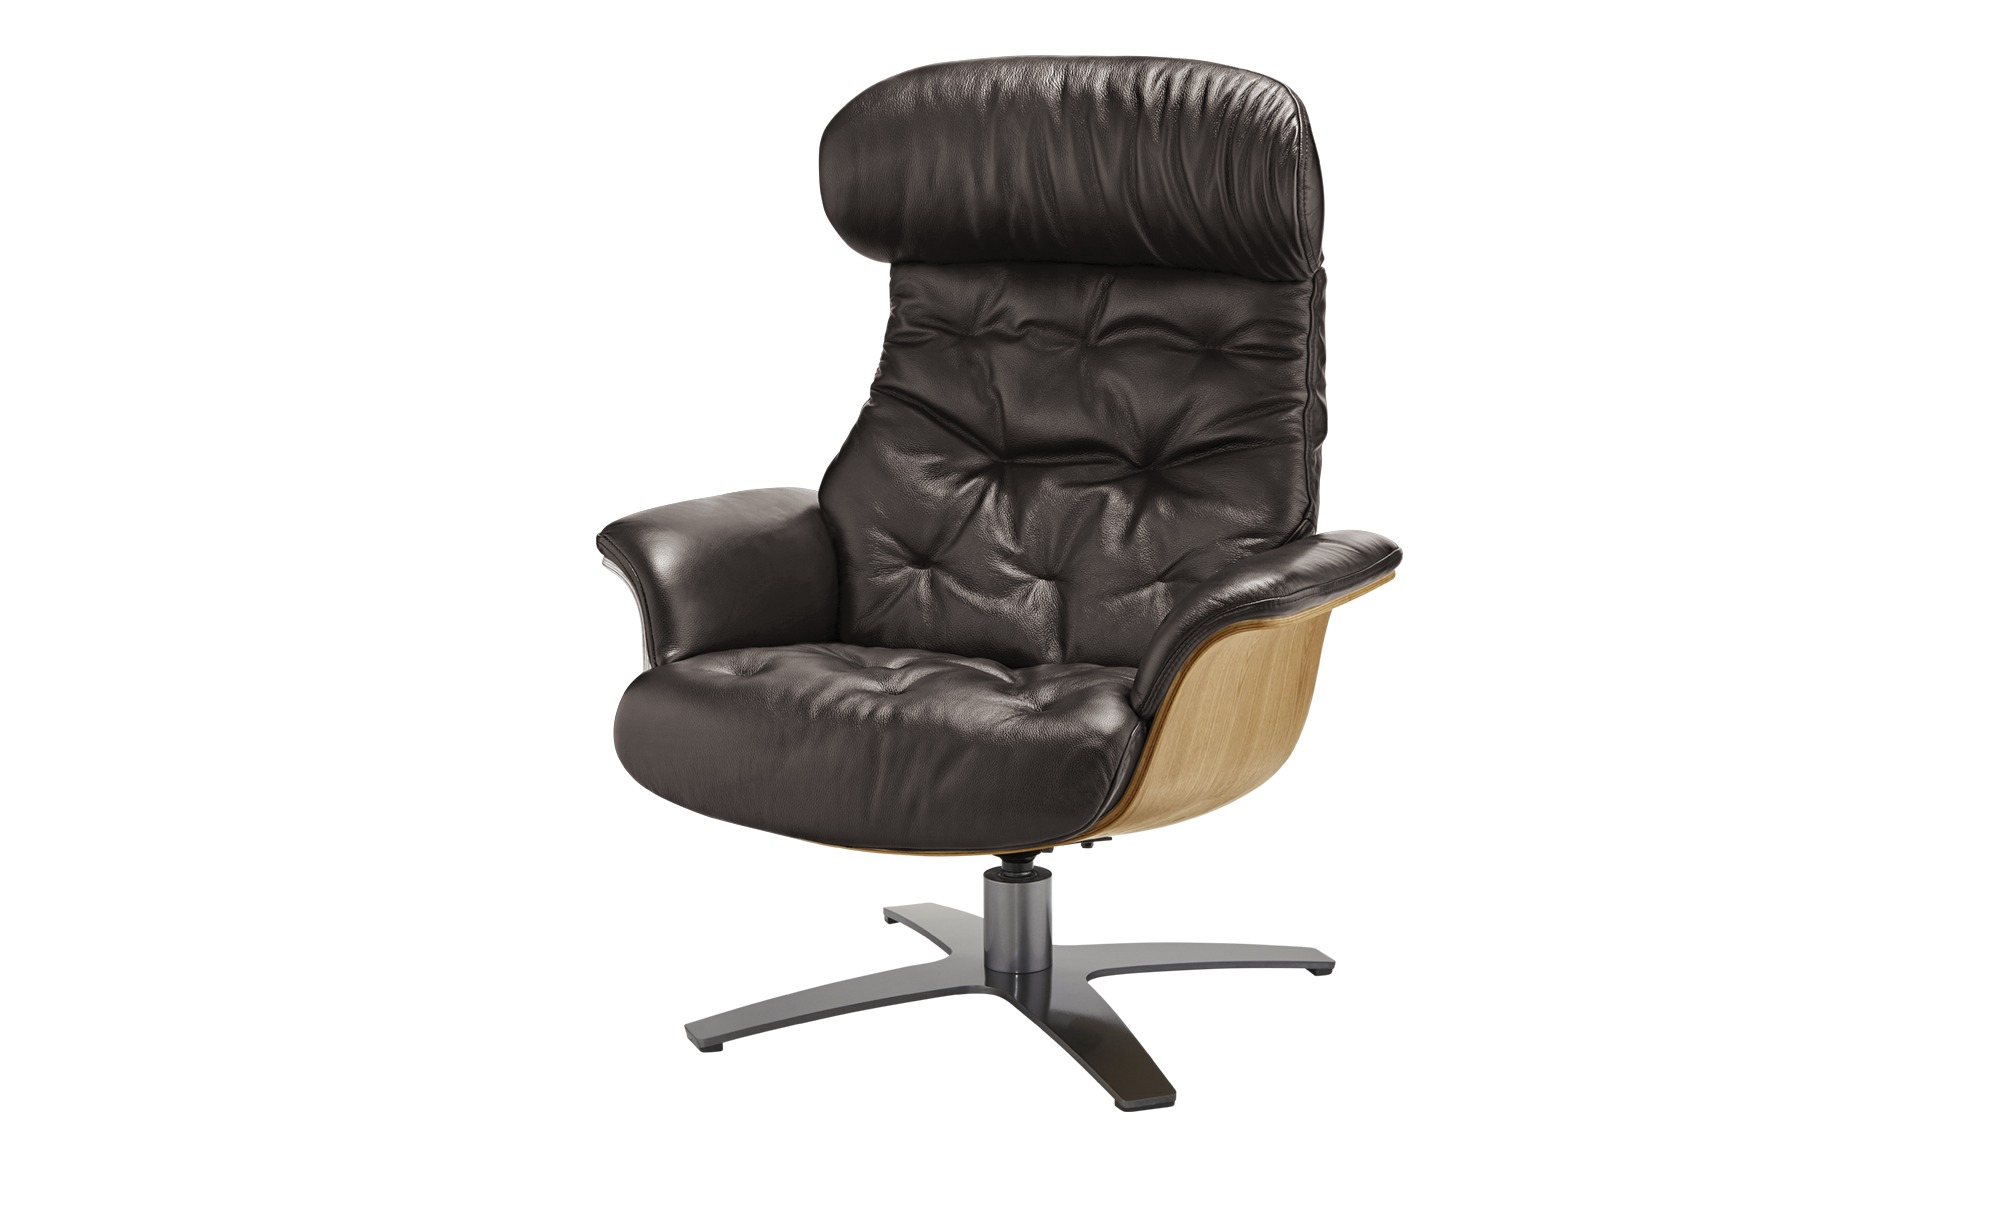 uno Relaxsessel  Charis ¦ braun ¦ Maße (cm): B: 79 H: 100 T: 84 Polstermöbel > Sessel > Ledersessel - Höffner